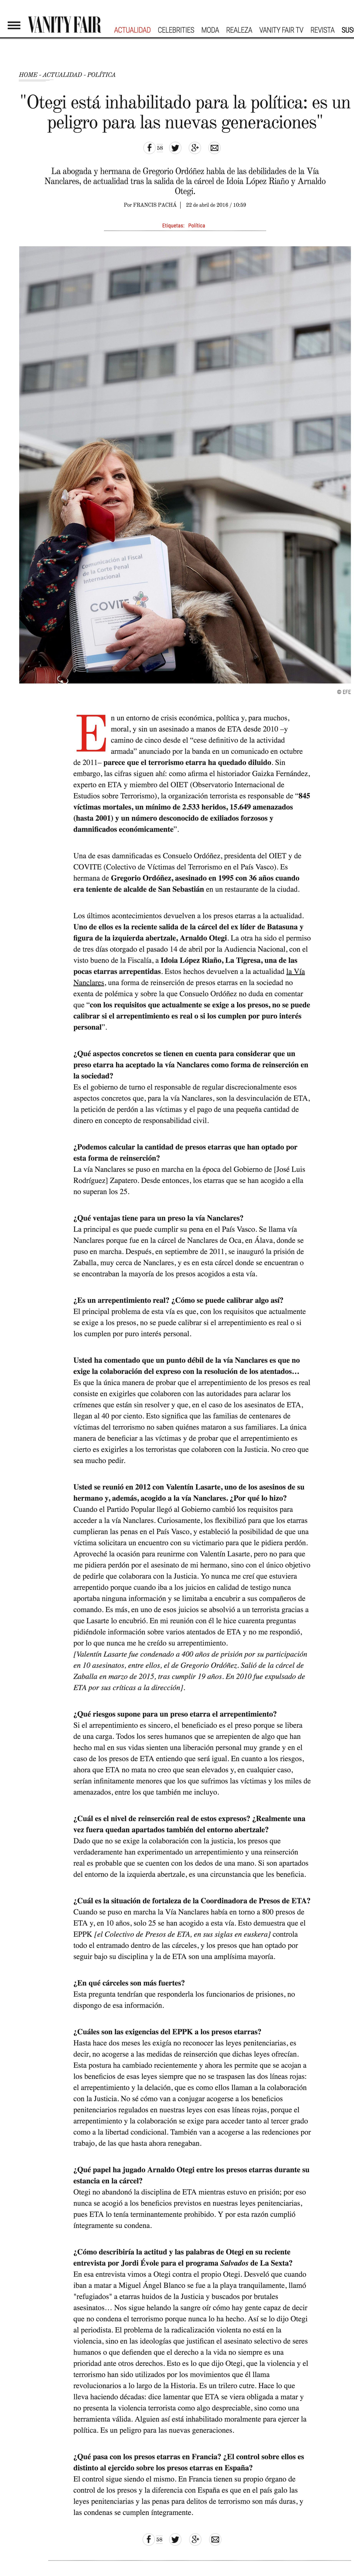 screencapture-www-revistavanityfair-es-actualidad-politica-articulos-consuelo-ordonez-entrevista-arnaldo-otegi-via-nanclares-22231-1467115101635